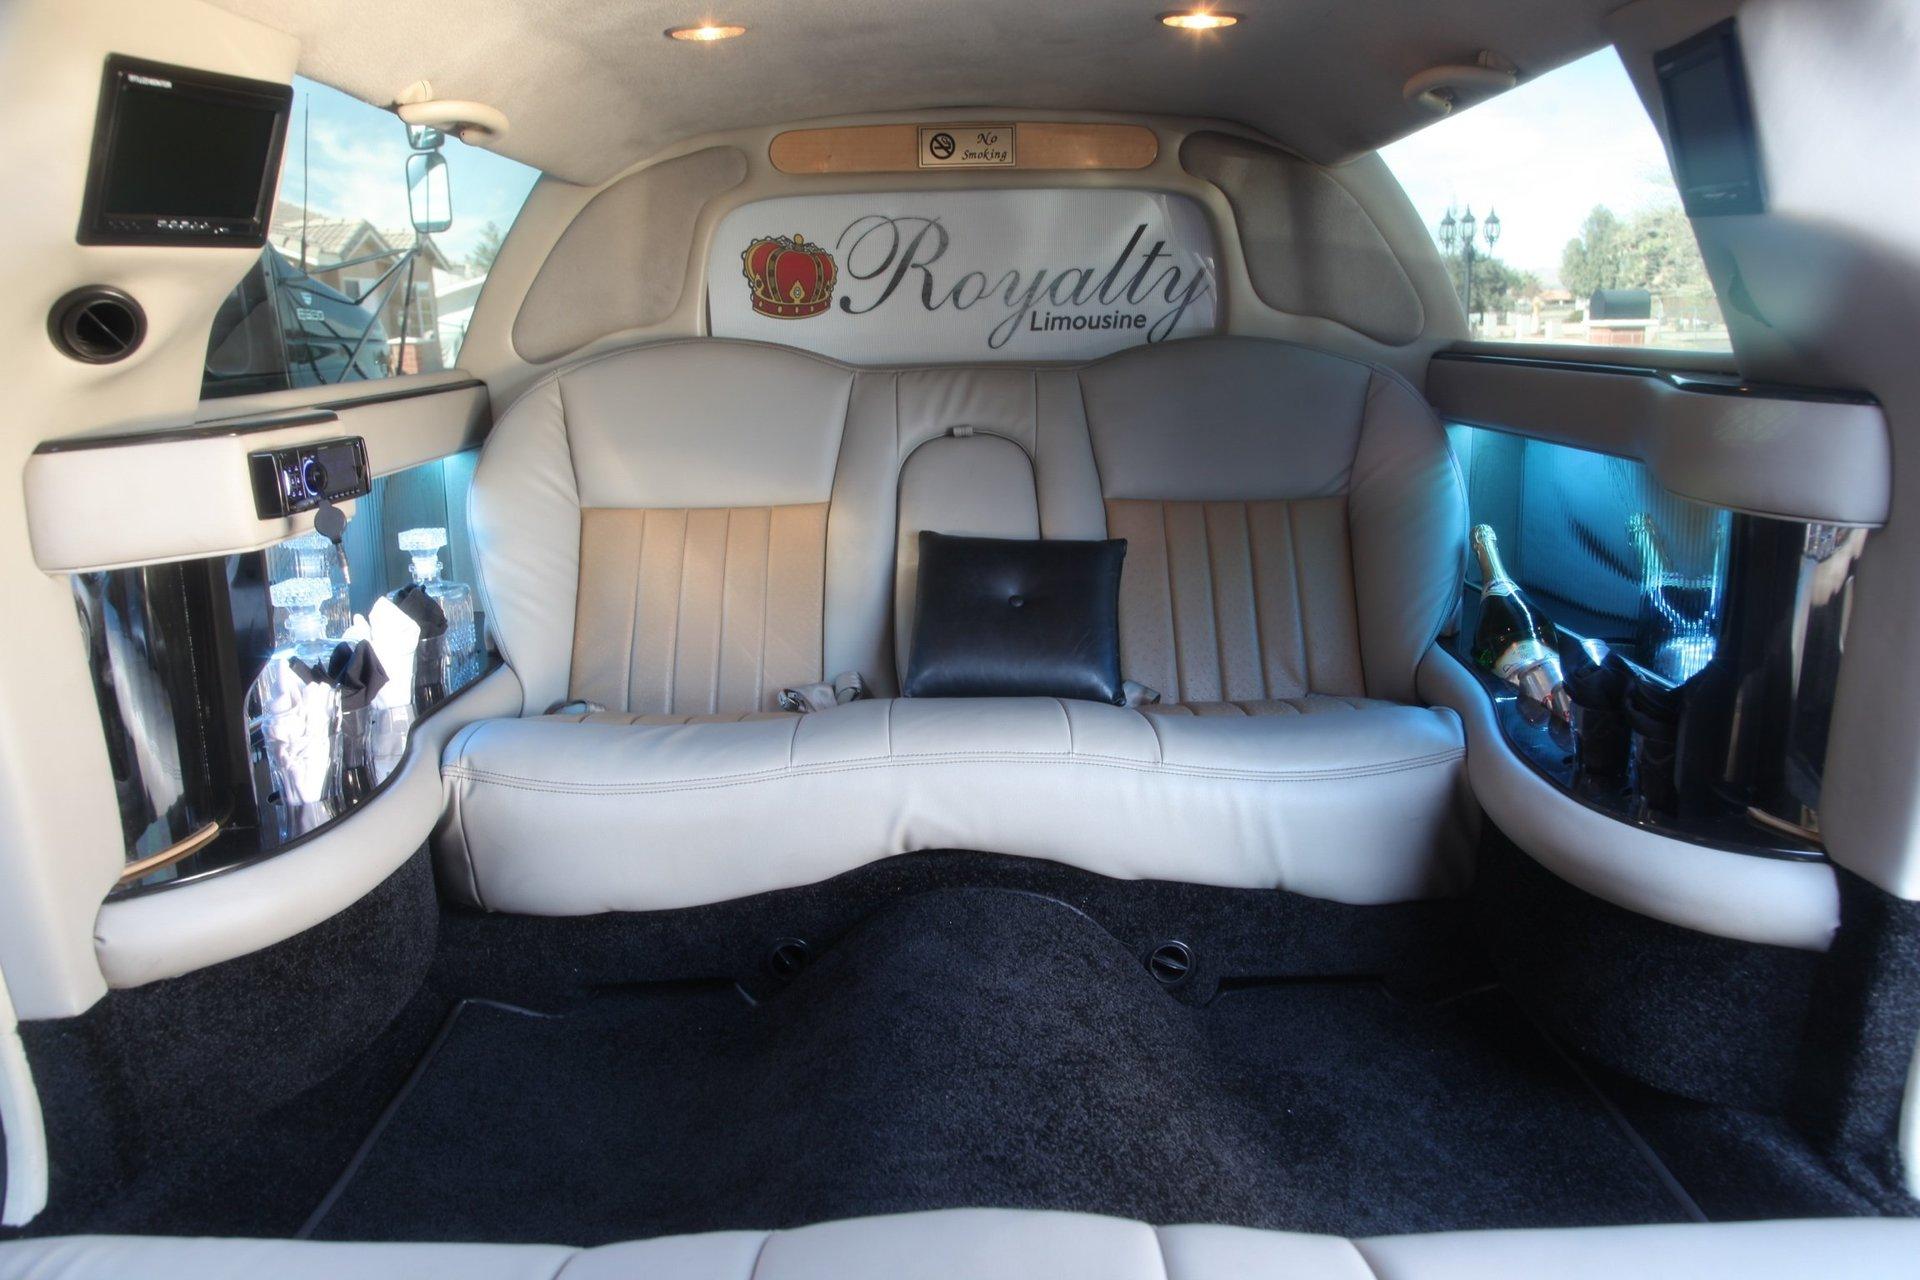 Royalty Limousine Services Inc image 6